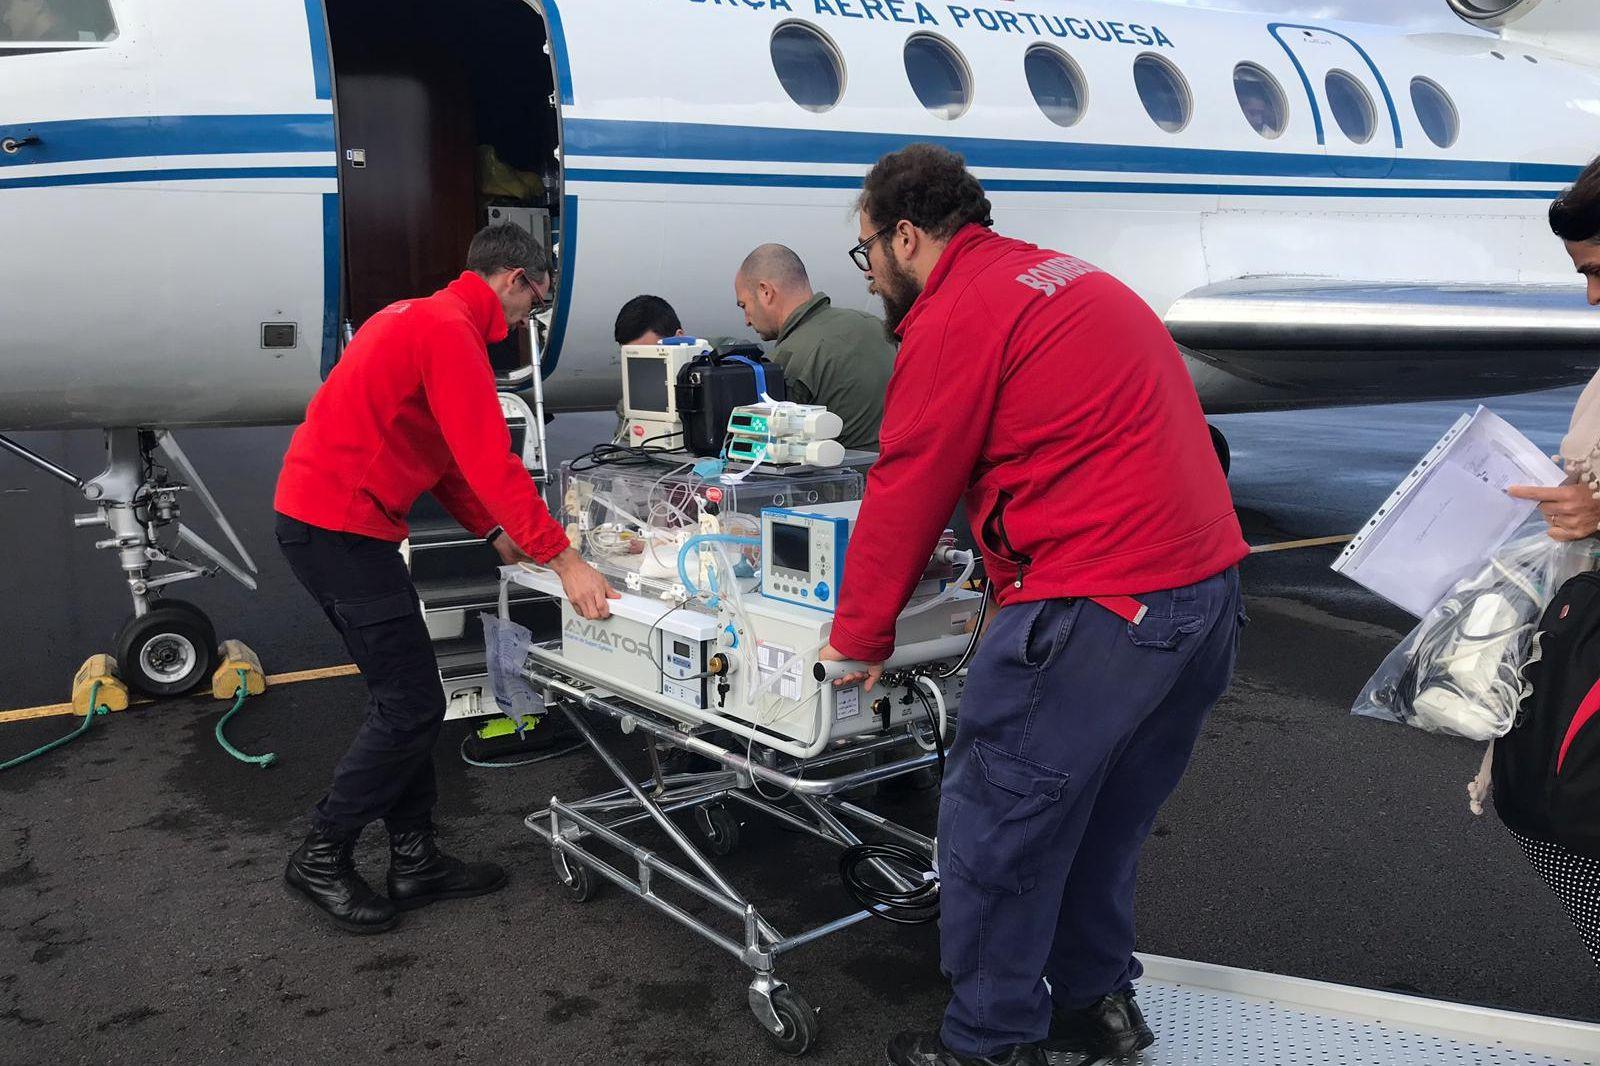 Força Aérea transporta bebé com asfixia perinatal dos Açores para Lisboa